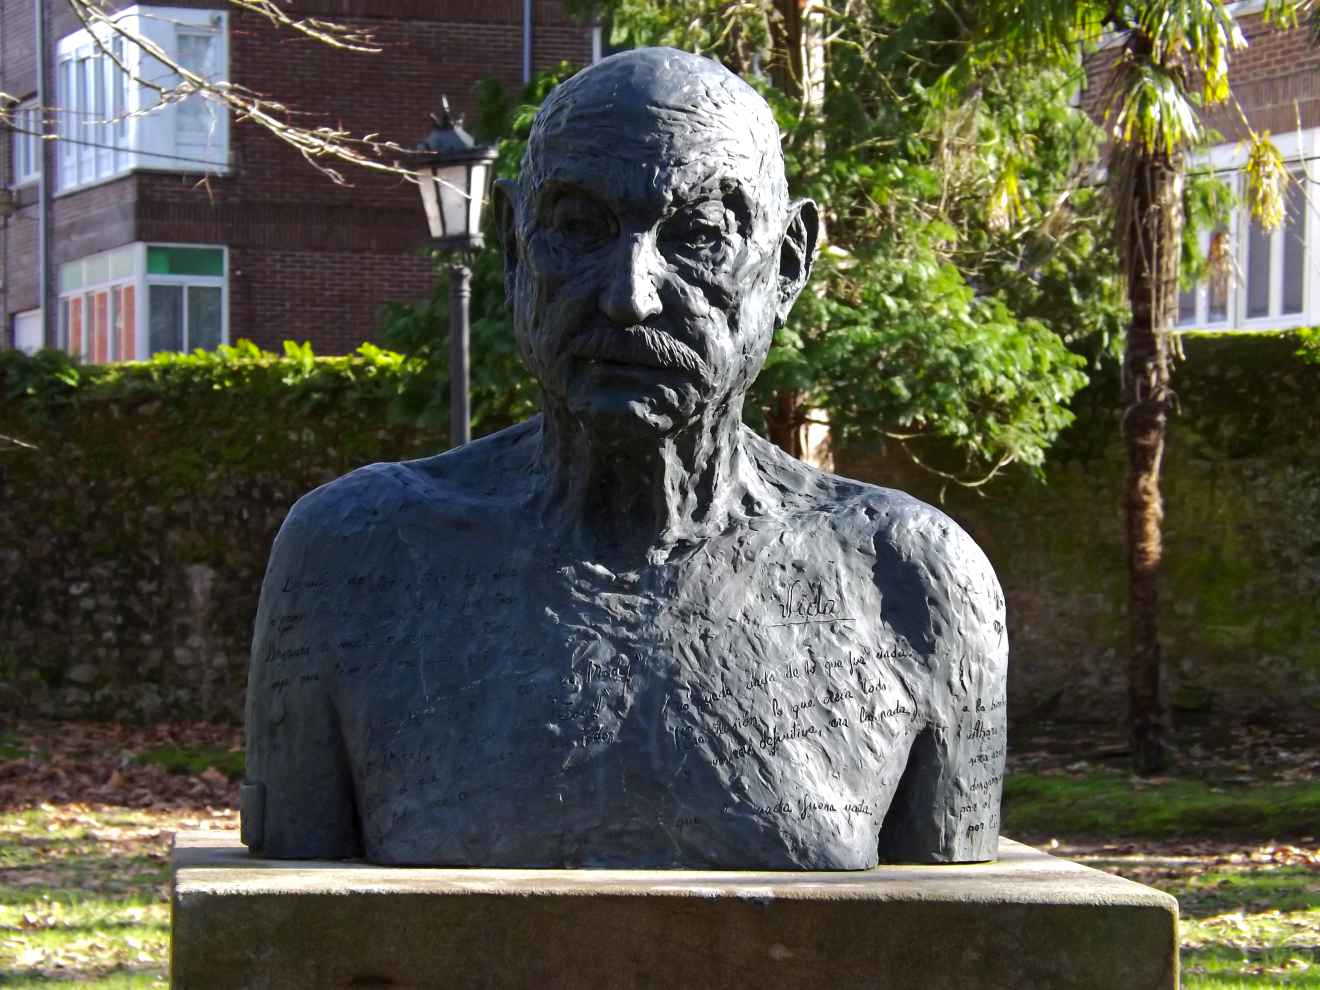 Busto de Pepe Hierro